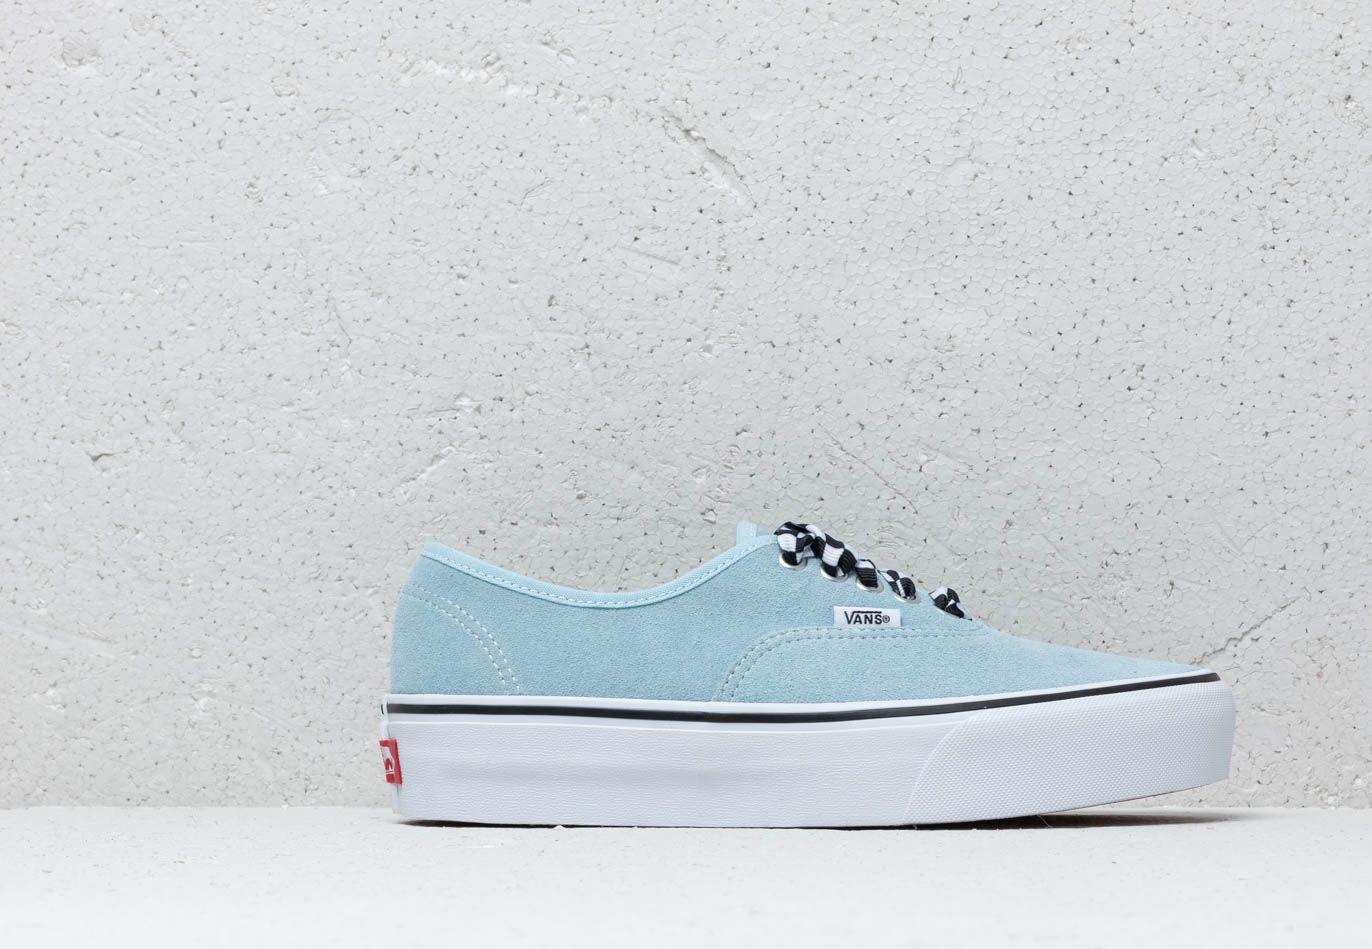 Vans Authentic Platform (Checkerboard lace) Cool Blue